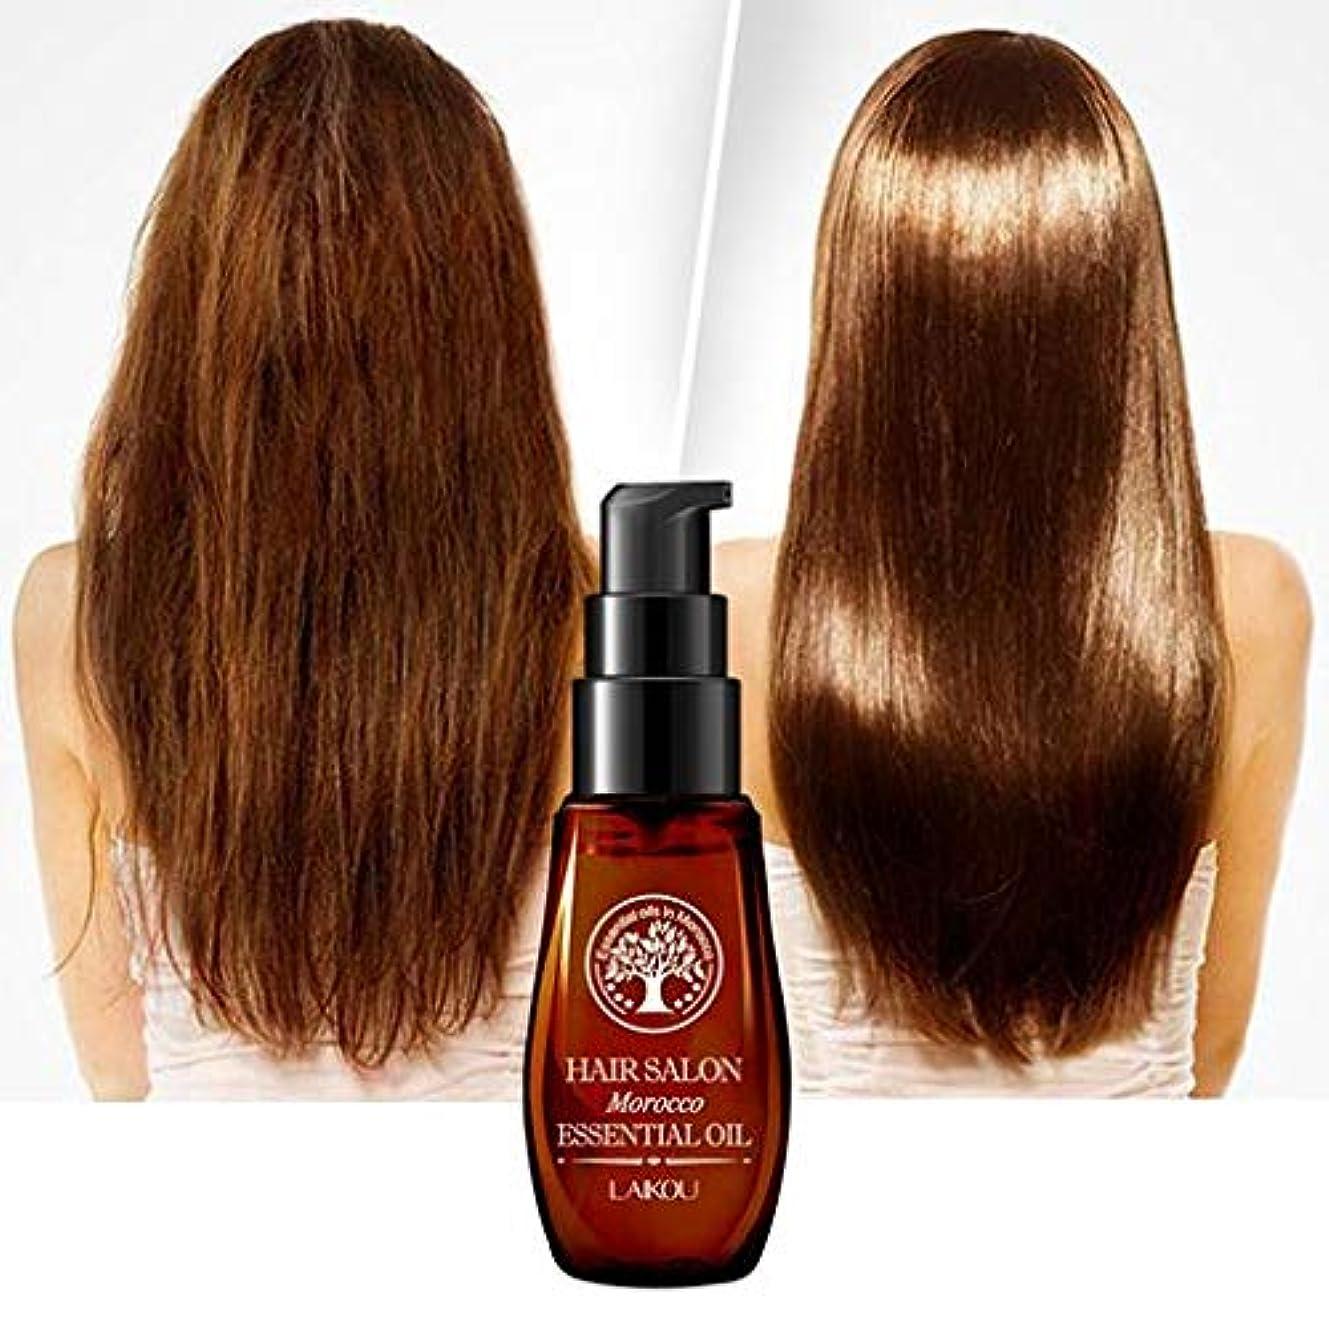 TerGOOSE ヘアオイル ヘアケアエッセンシャルオイル オイル モロッコ グリセロール ツヤ髪 薄毛改善 ヘア保護 艶髪 静電気防止